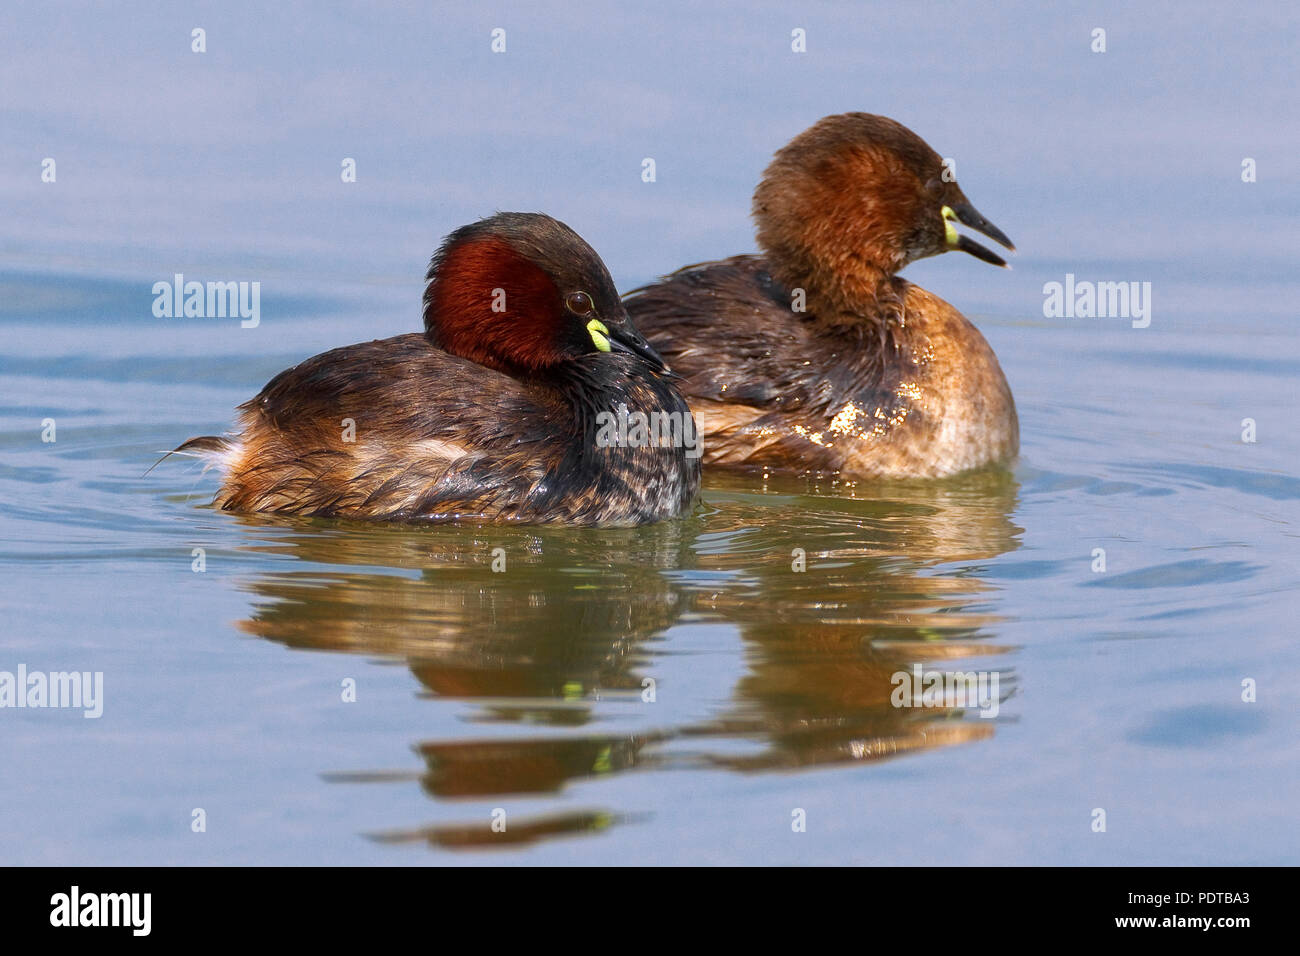 Twee zwemmende Dodaarsen. Two Little Grebes swimming. Stock Photo